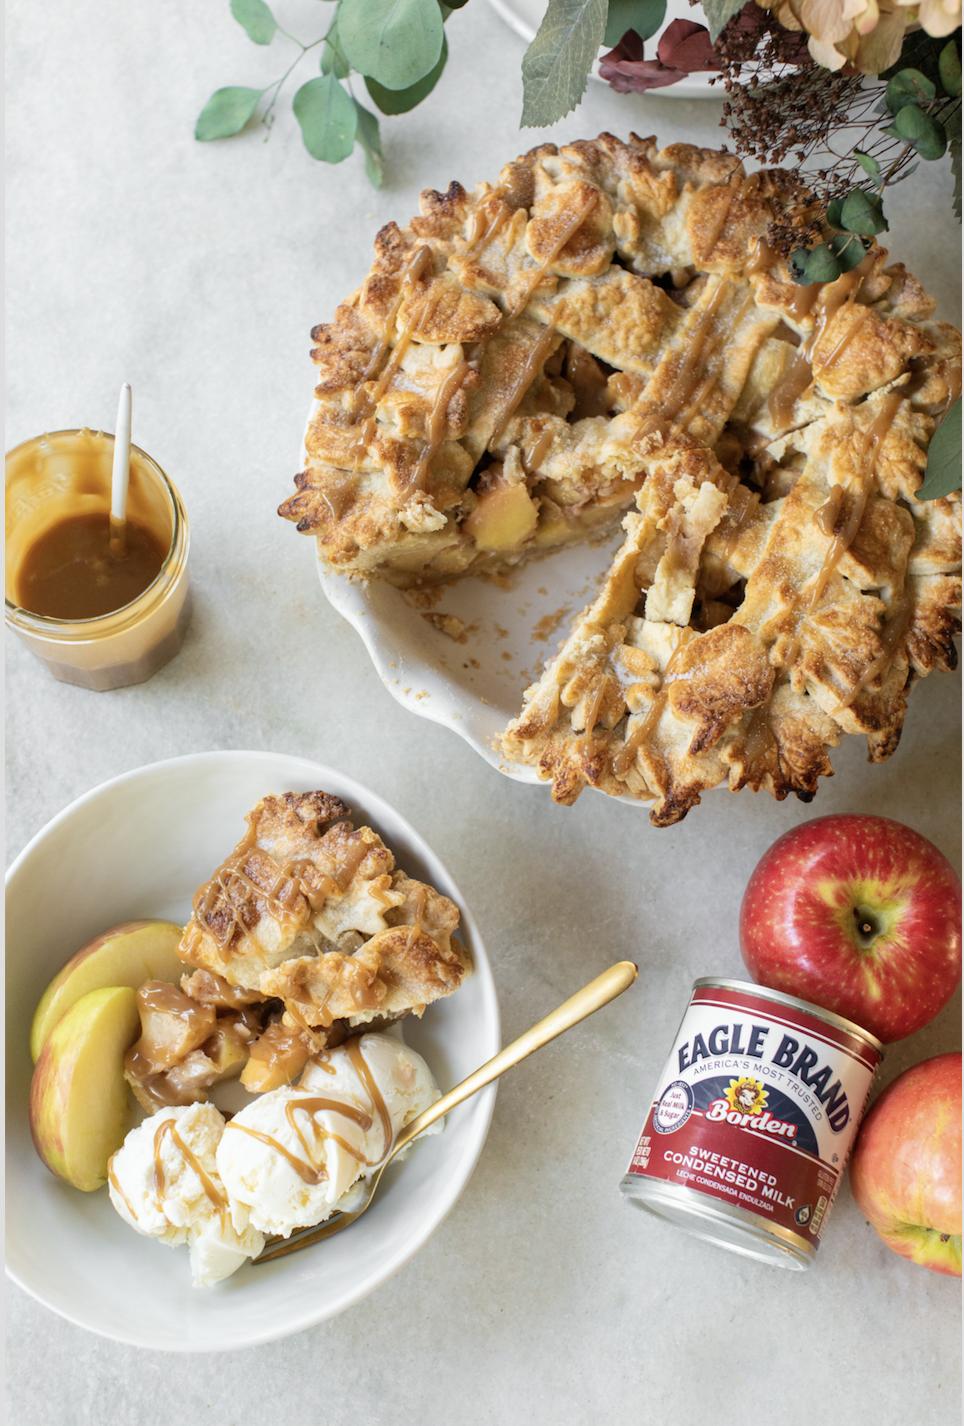 Caramel Apple Pie Recipe In 2020 Food Recipes Breakfast Dessert Apple Recipes